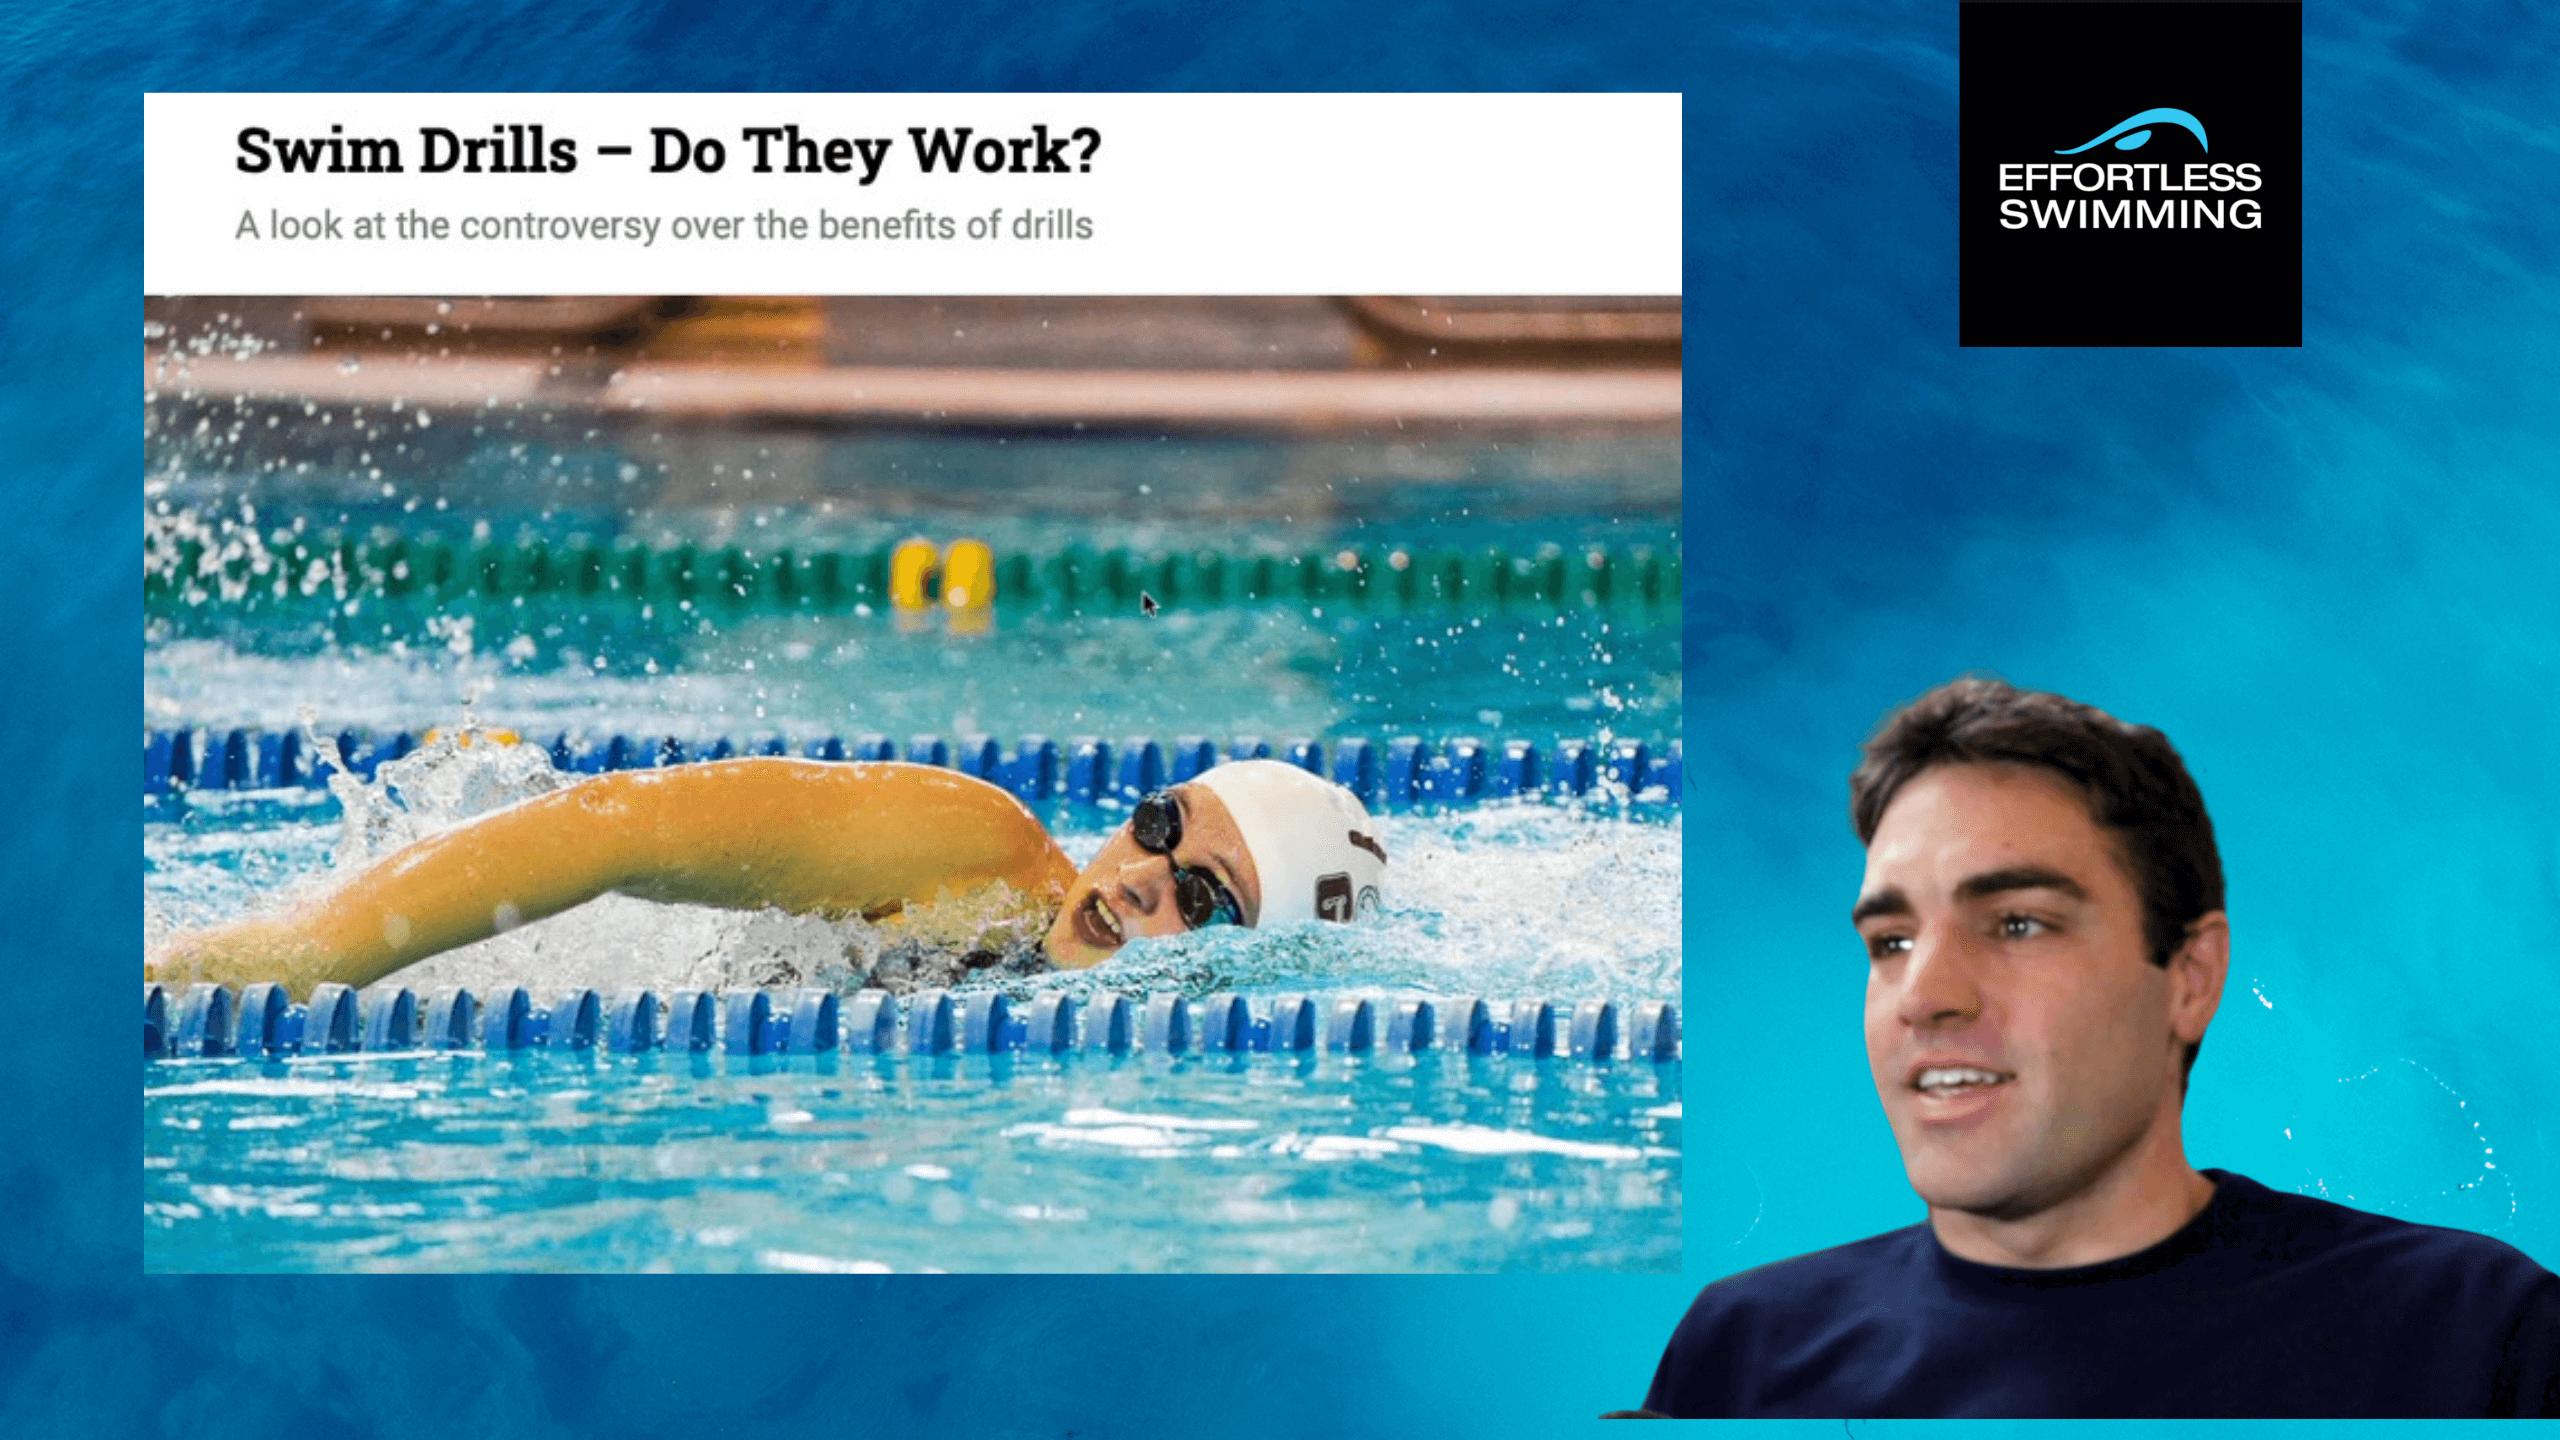 Do Swim Drills Work?